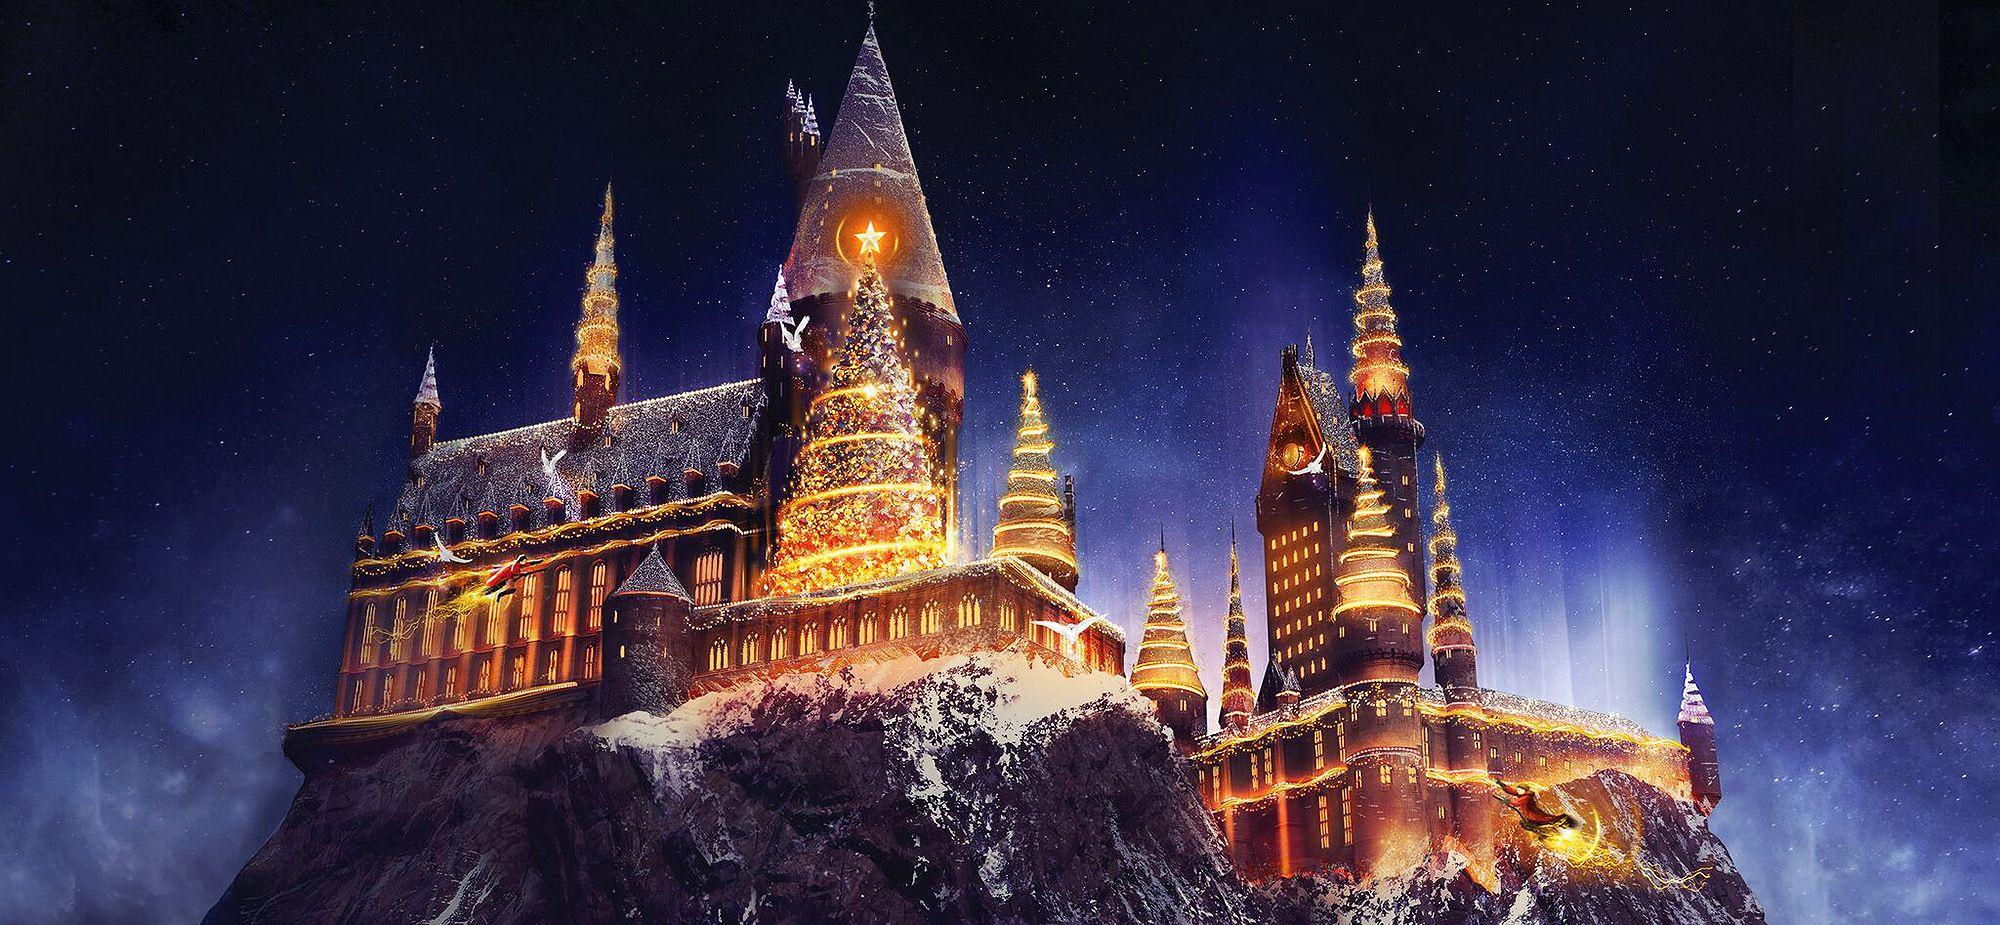 Hogwarts Universal